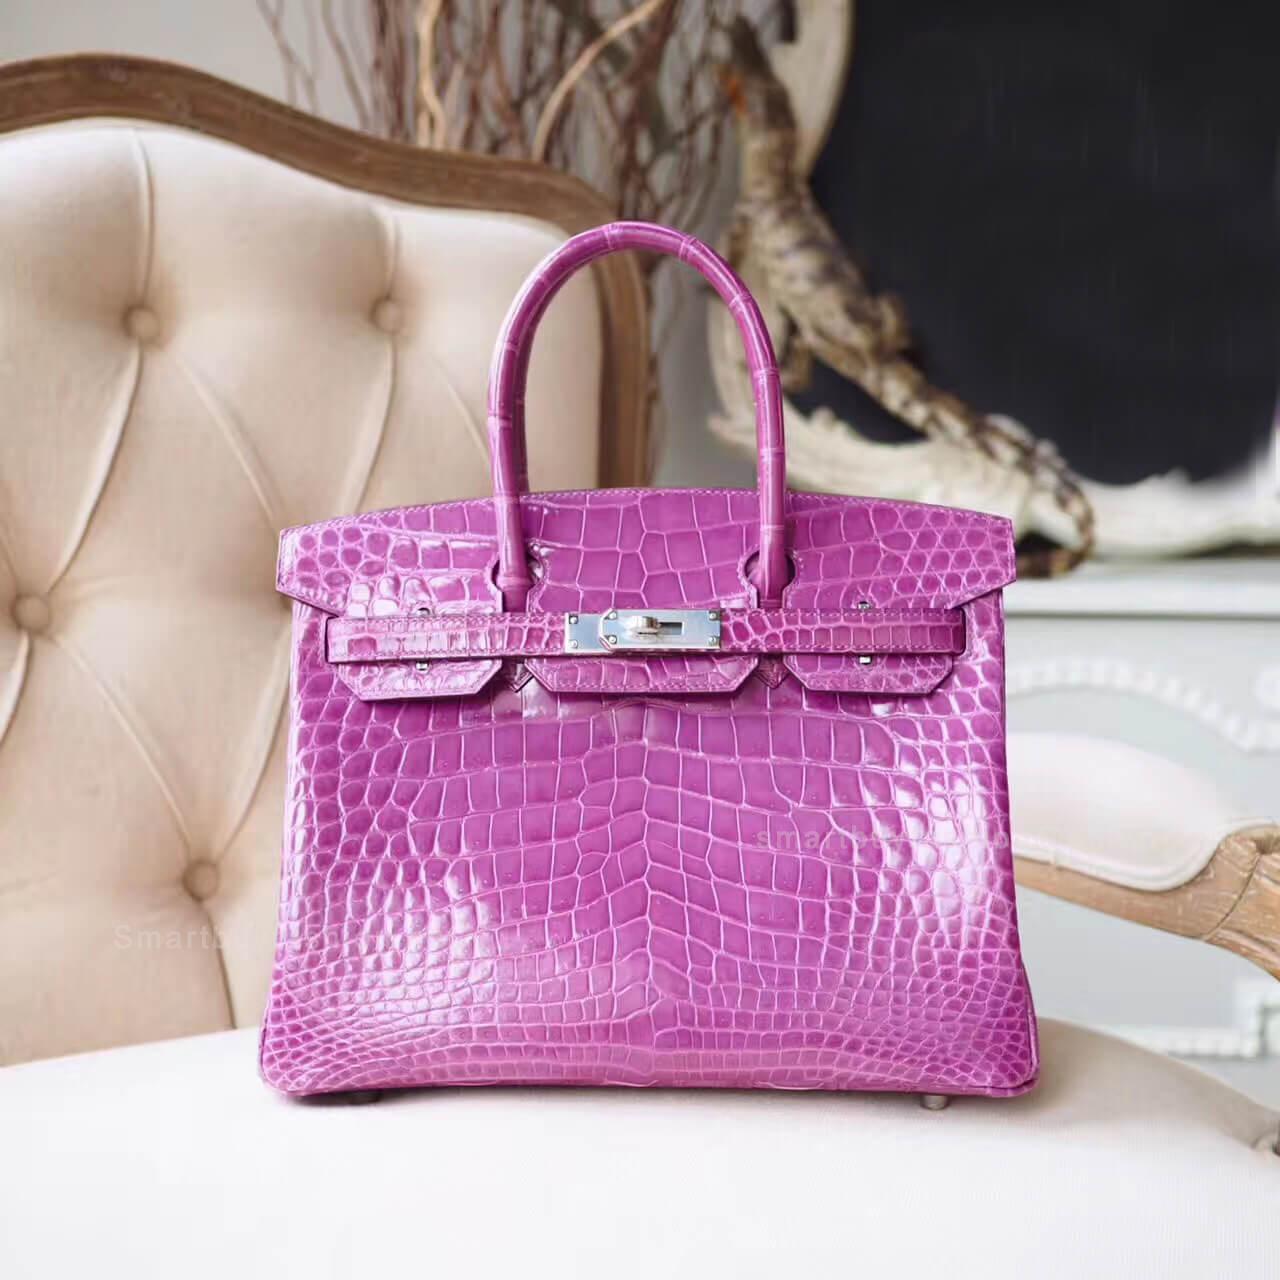 60766715a499 Hermes Birkin 30 Bag in Violet Shiny Porosus Croc PHW